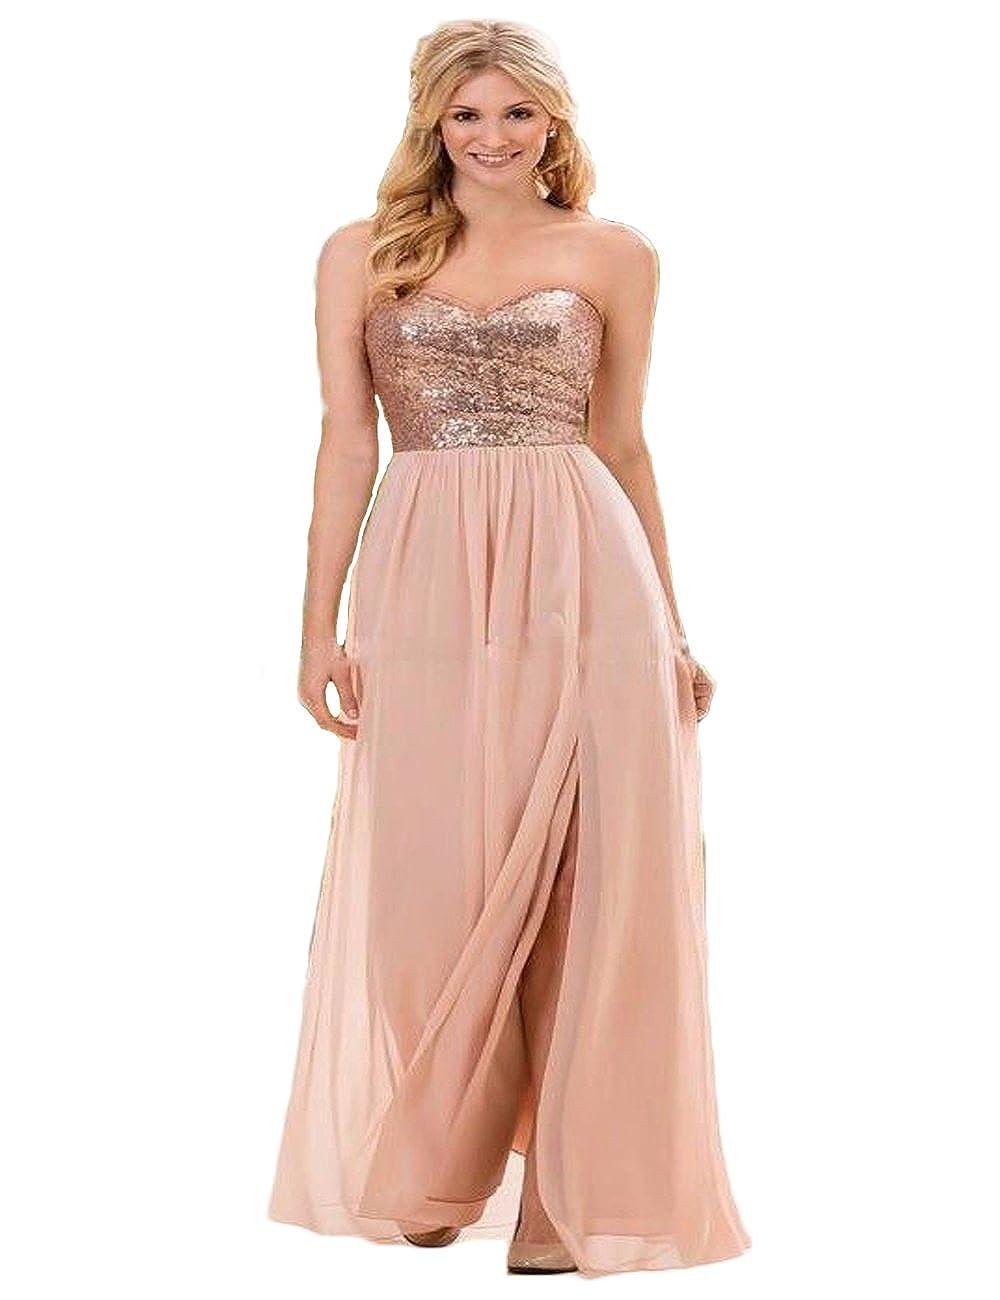 BKSKK Strapless Sequins Bridesmaid Dresses Formal Long Split Side Wedding Party Dress